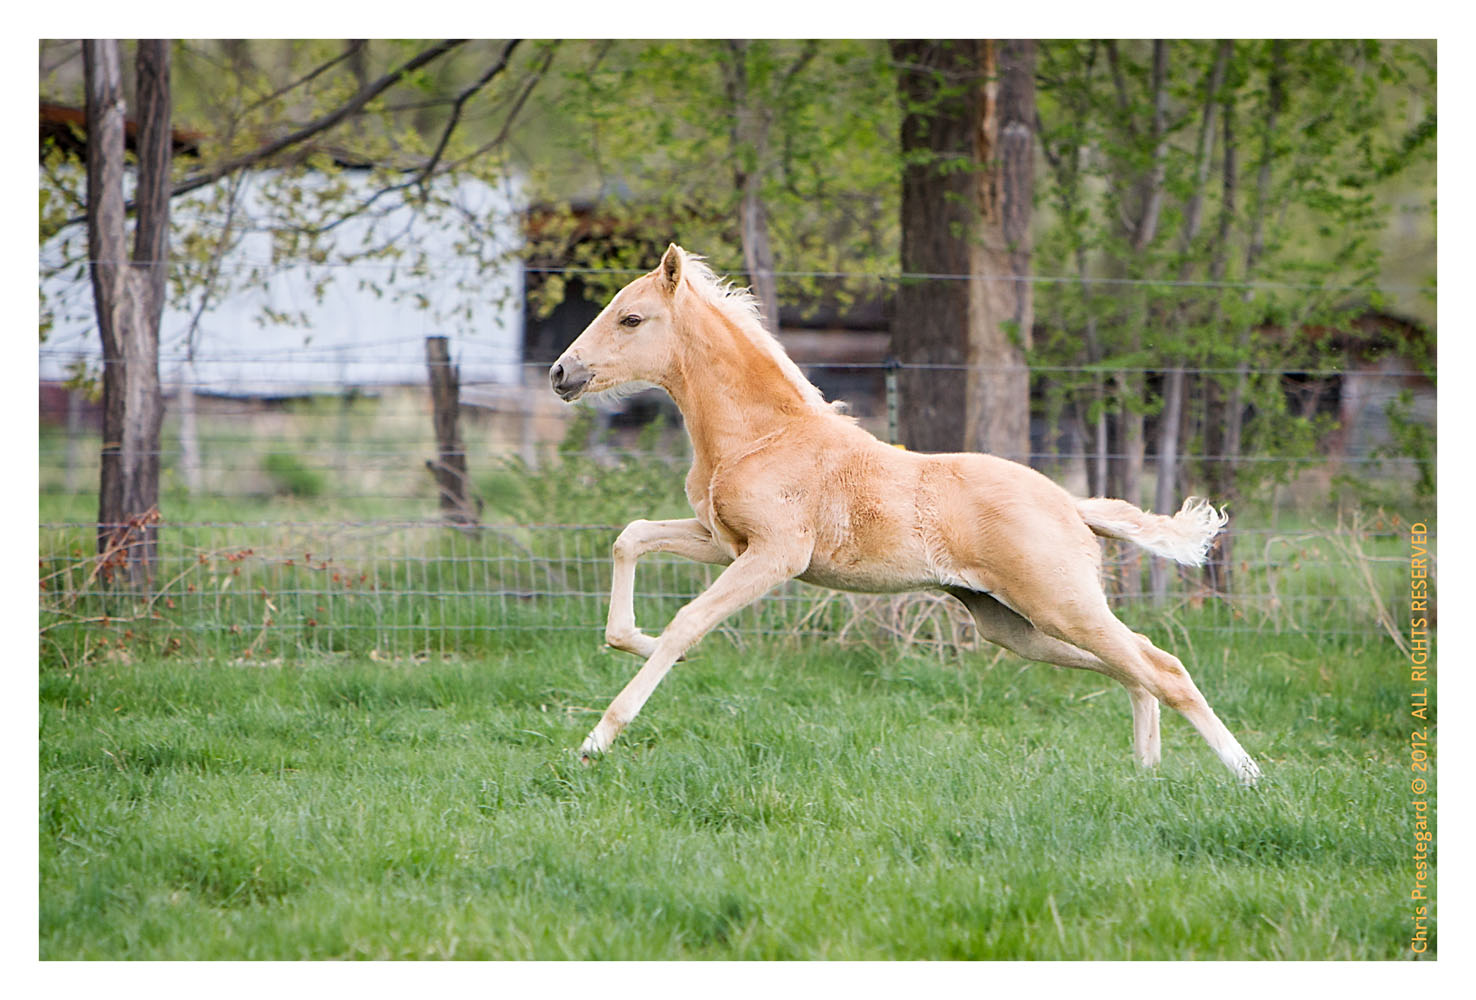 Horse1399-Feb12-2012